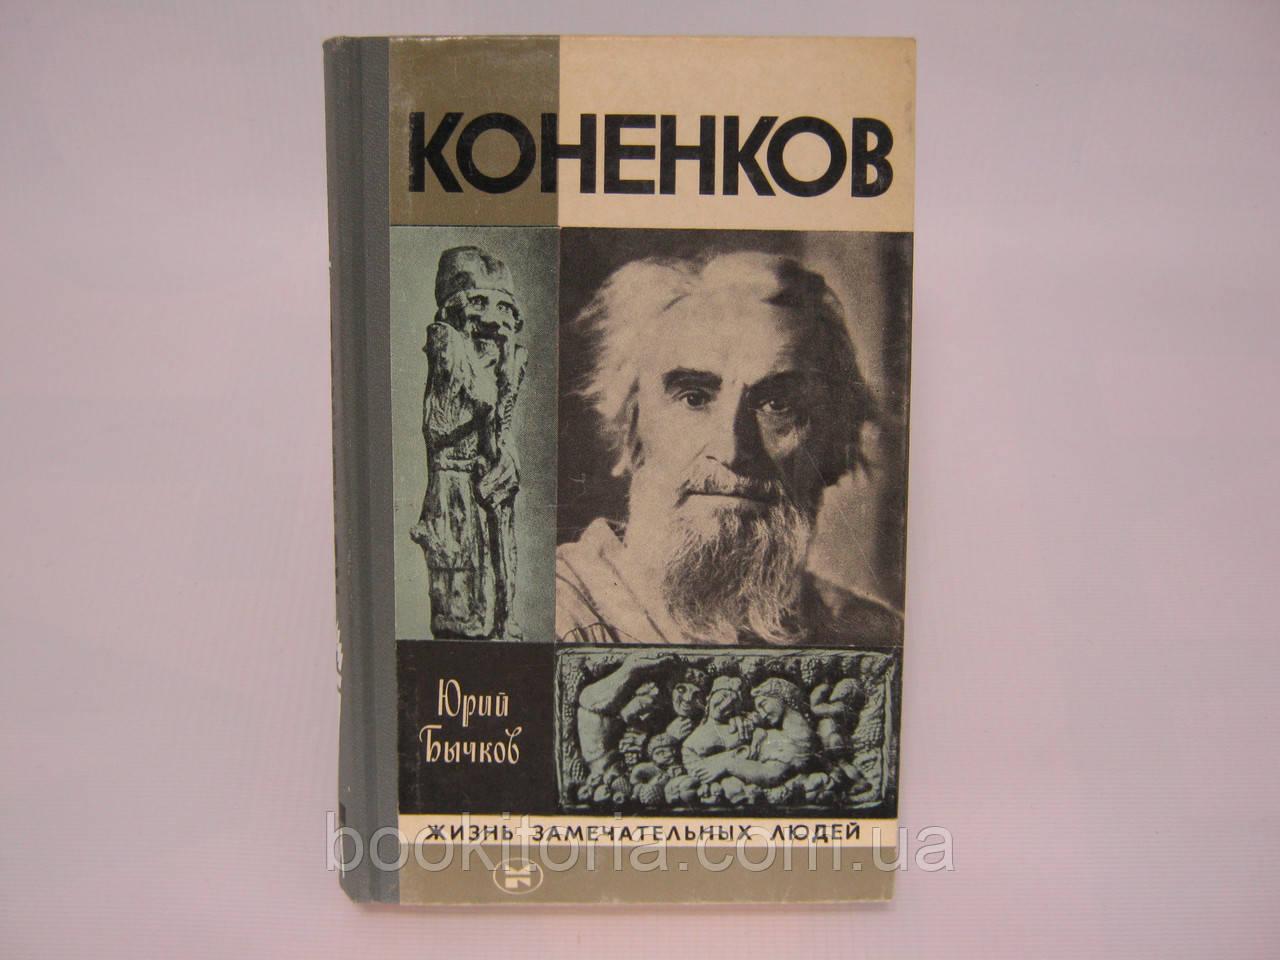 Бычков Ю.А. Коненков (б/у).